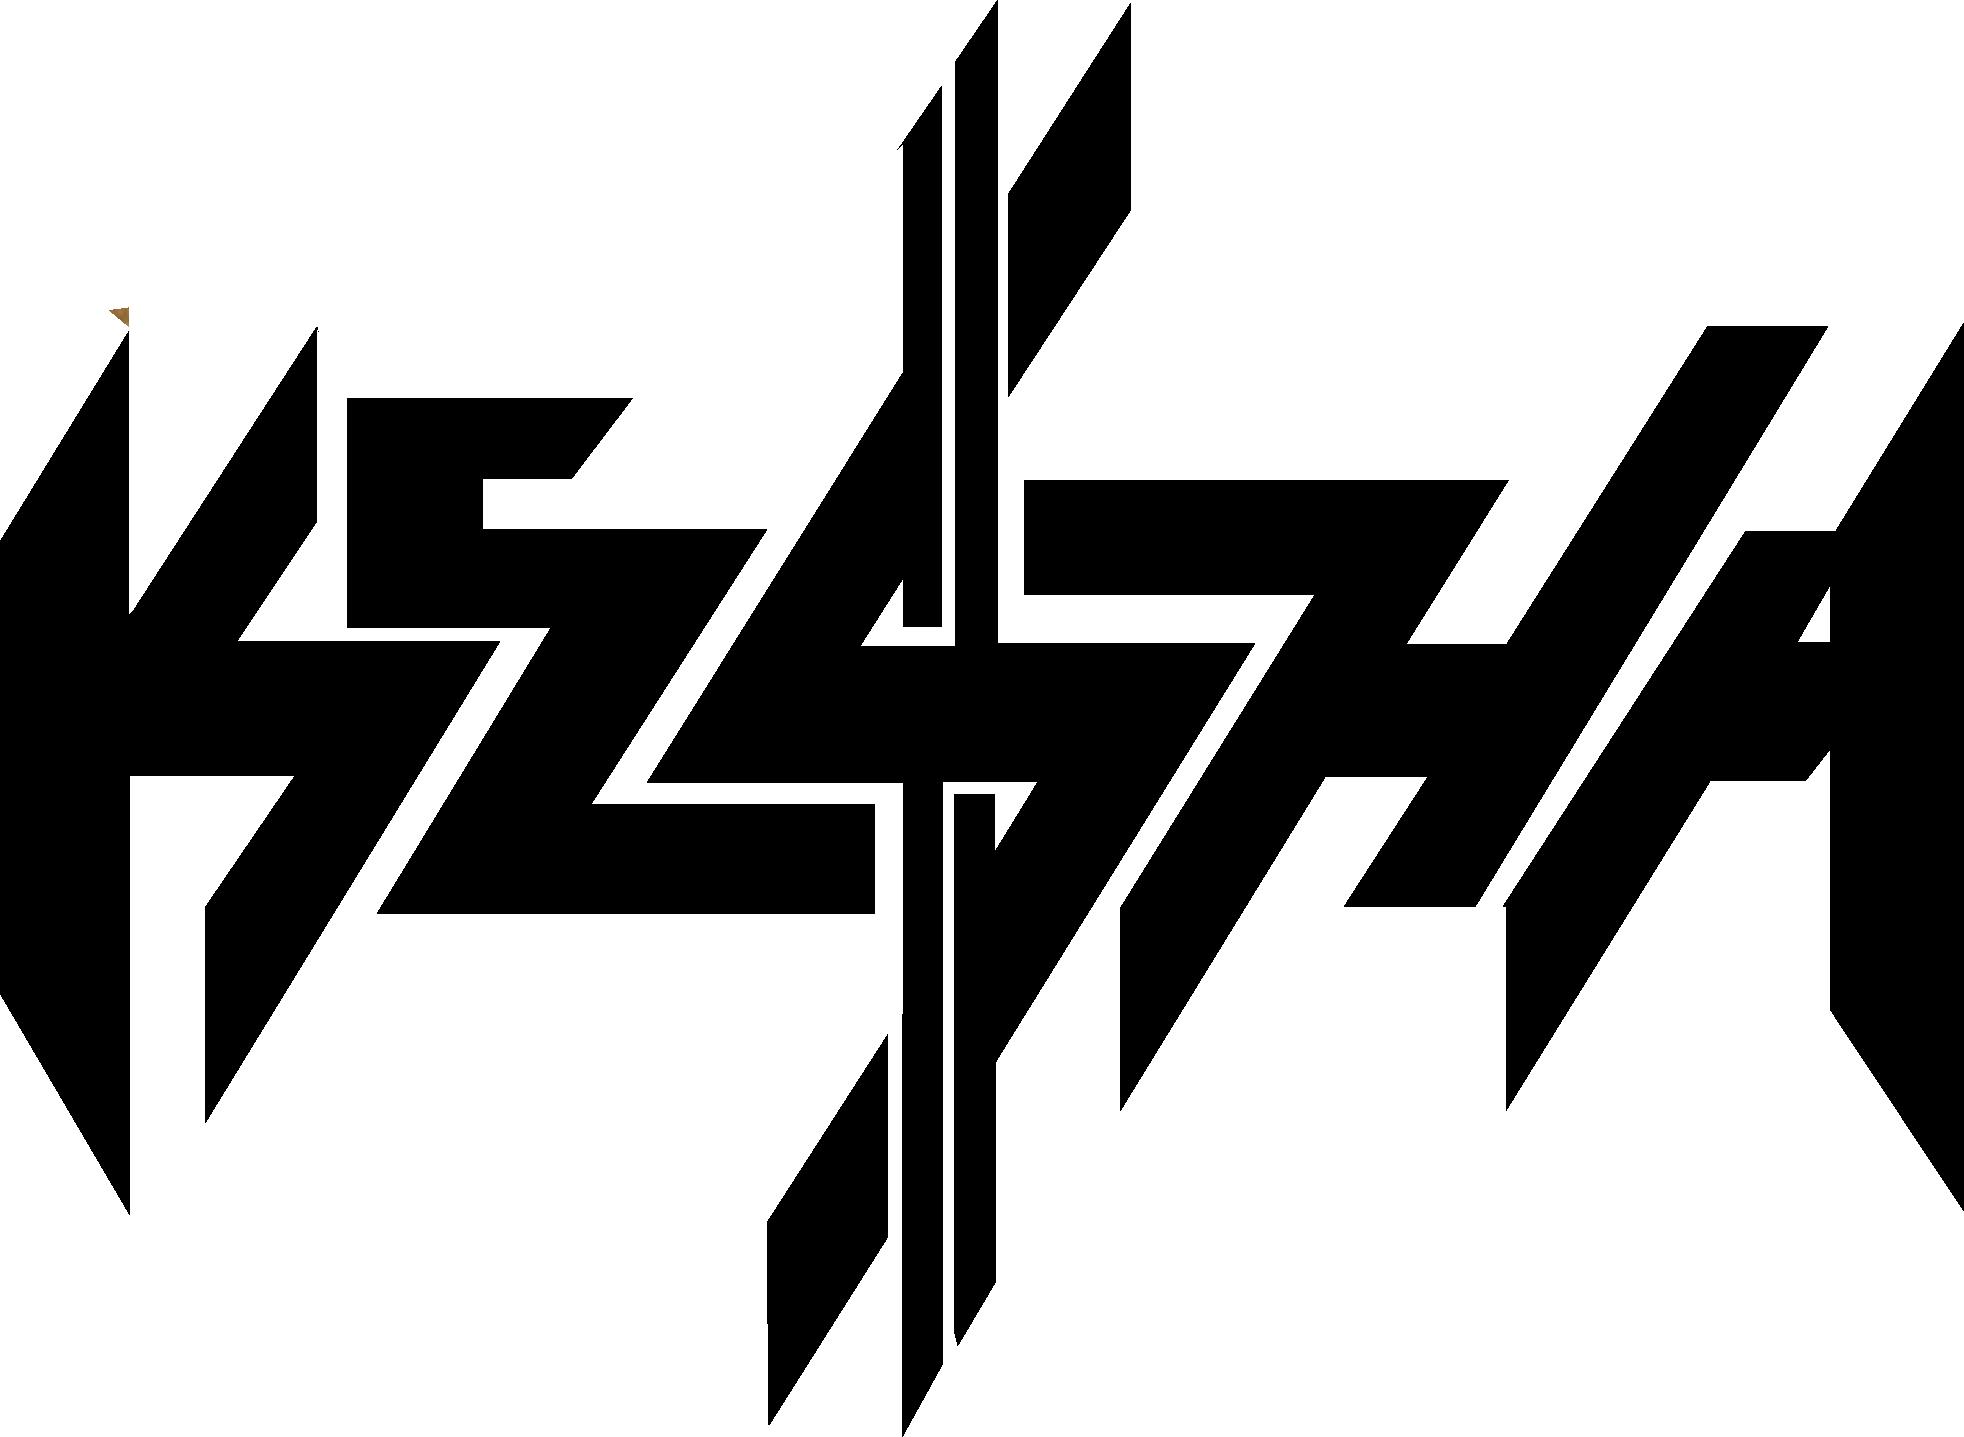 File:Kesha's new logo.png.